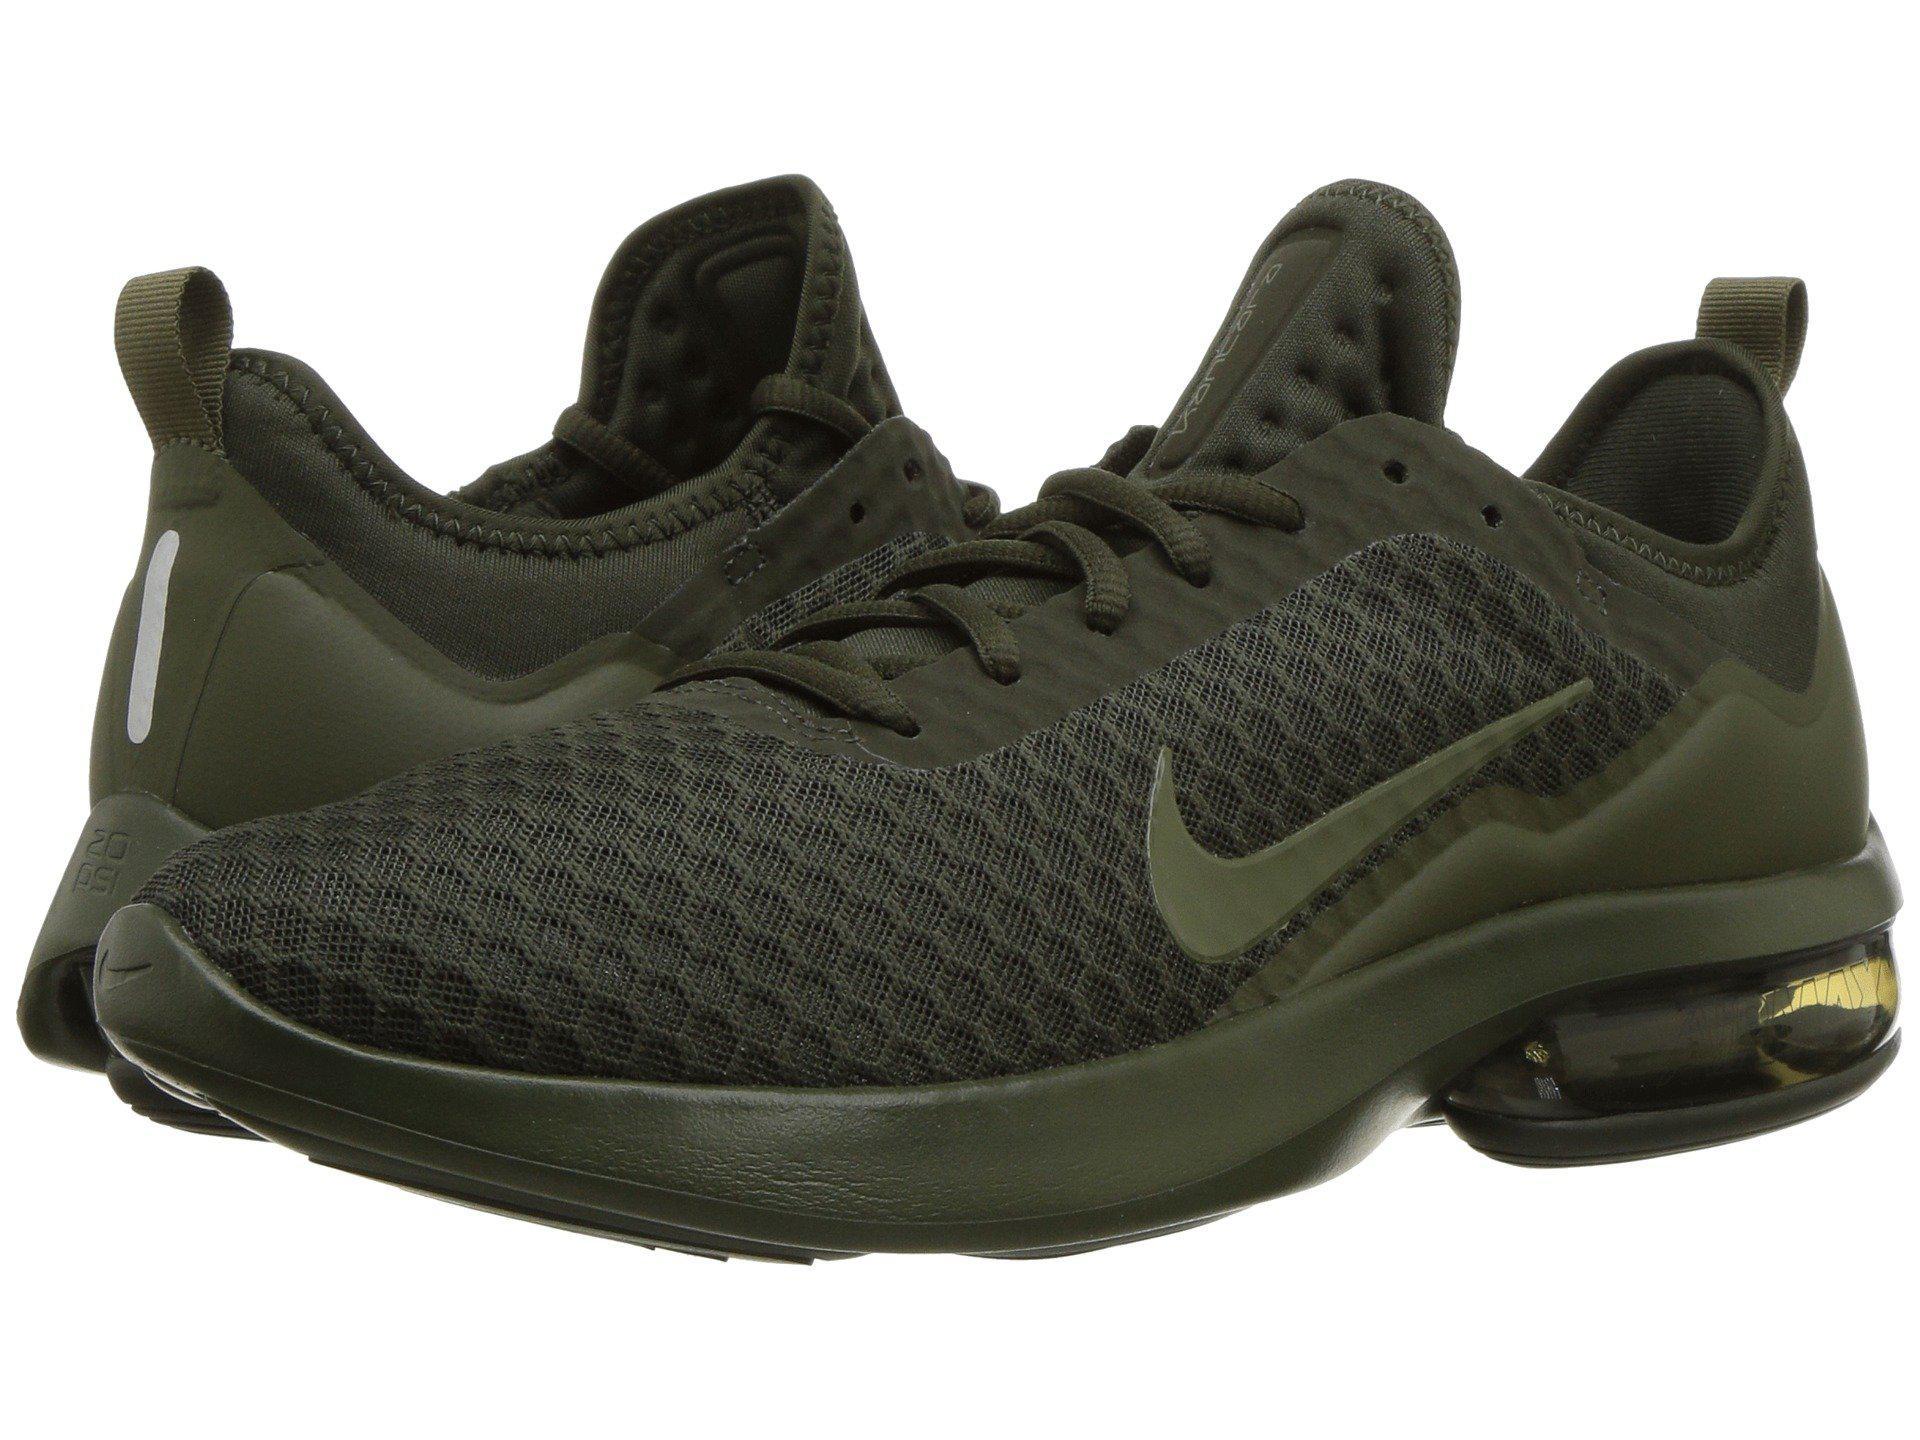 f85f5d57a9 Nike Air Max Kantara (moon Particle/sepia Stone/vast Grey) Men's ...